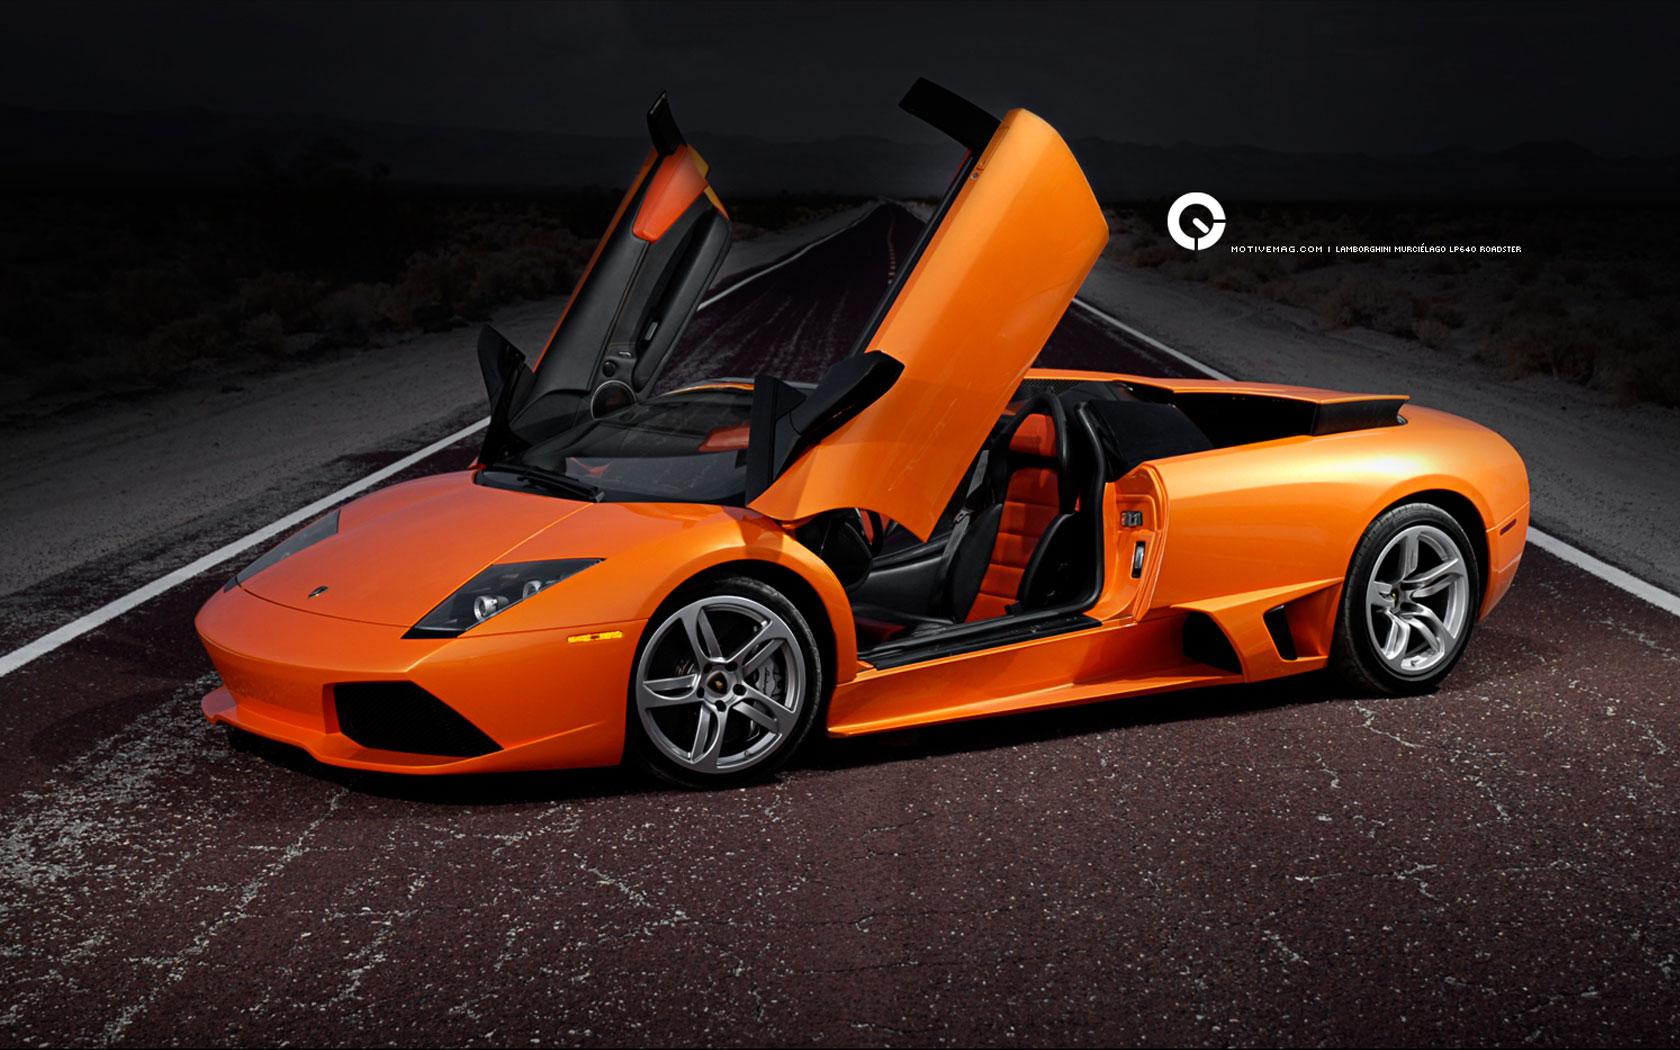 Lamborghini Murcielago Widescreen Wallpapers HD Wallpapers 1680x1050